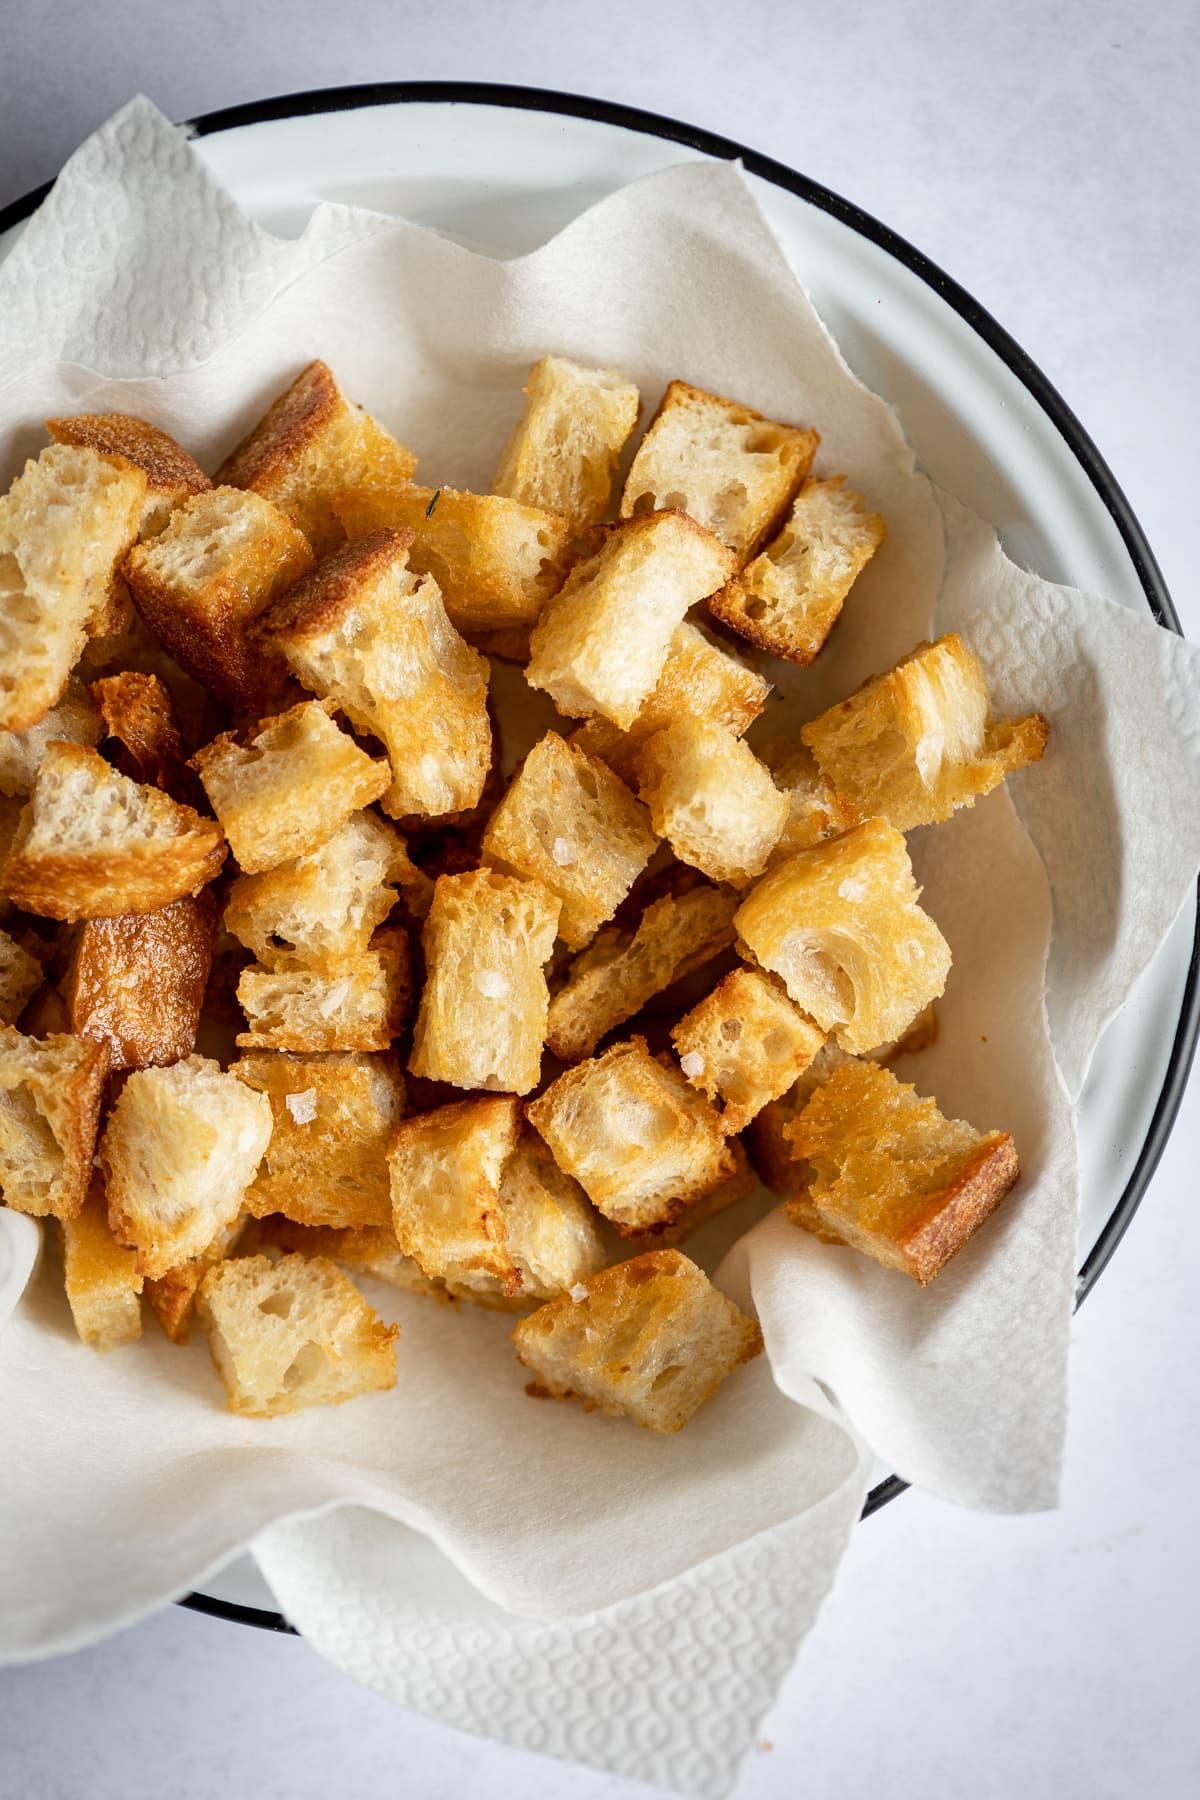 Fried sourdough bread with garlic in a bowl